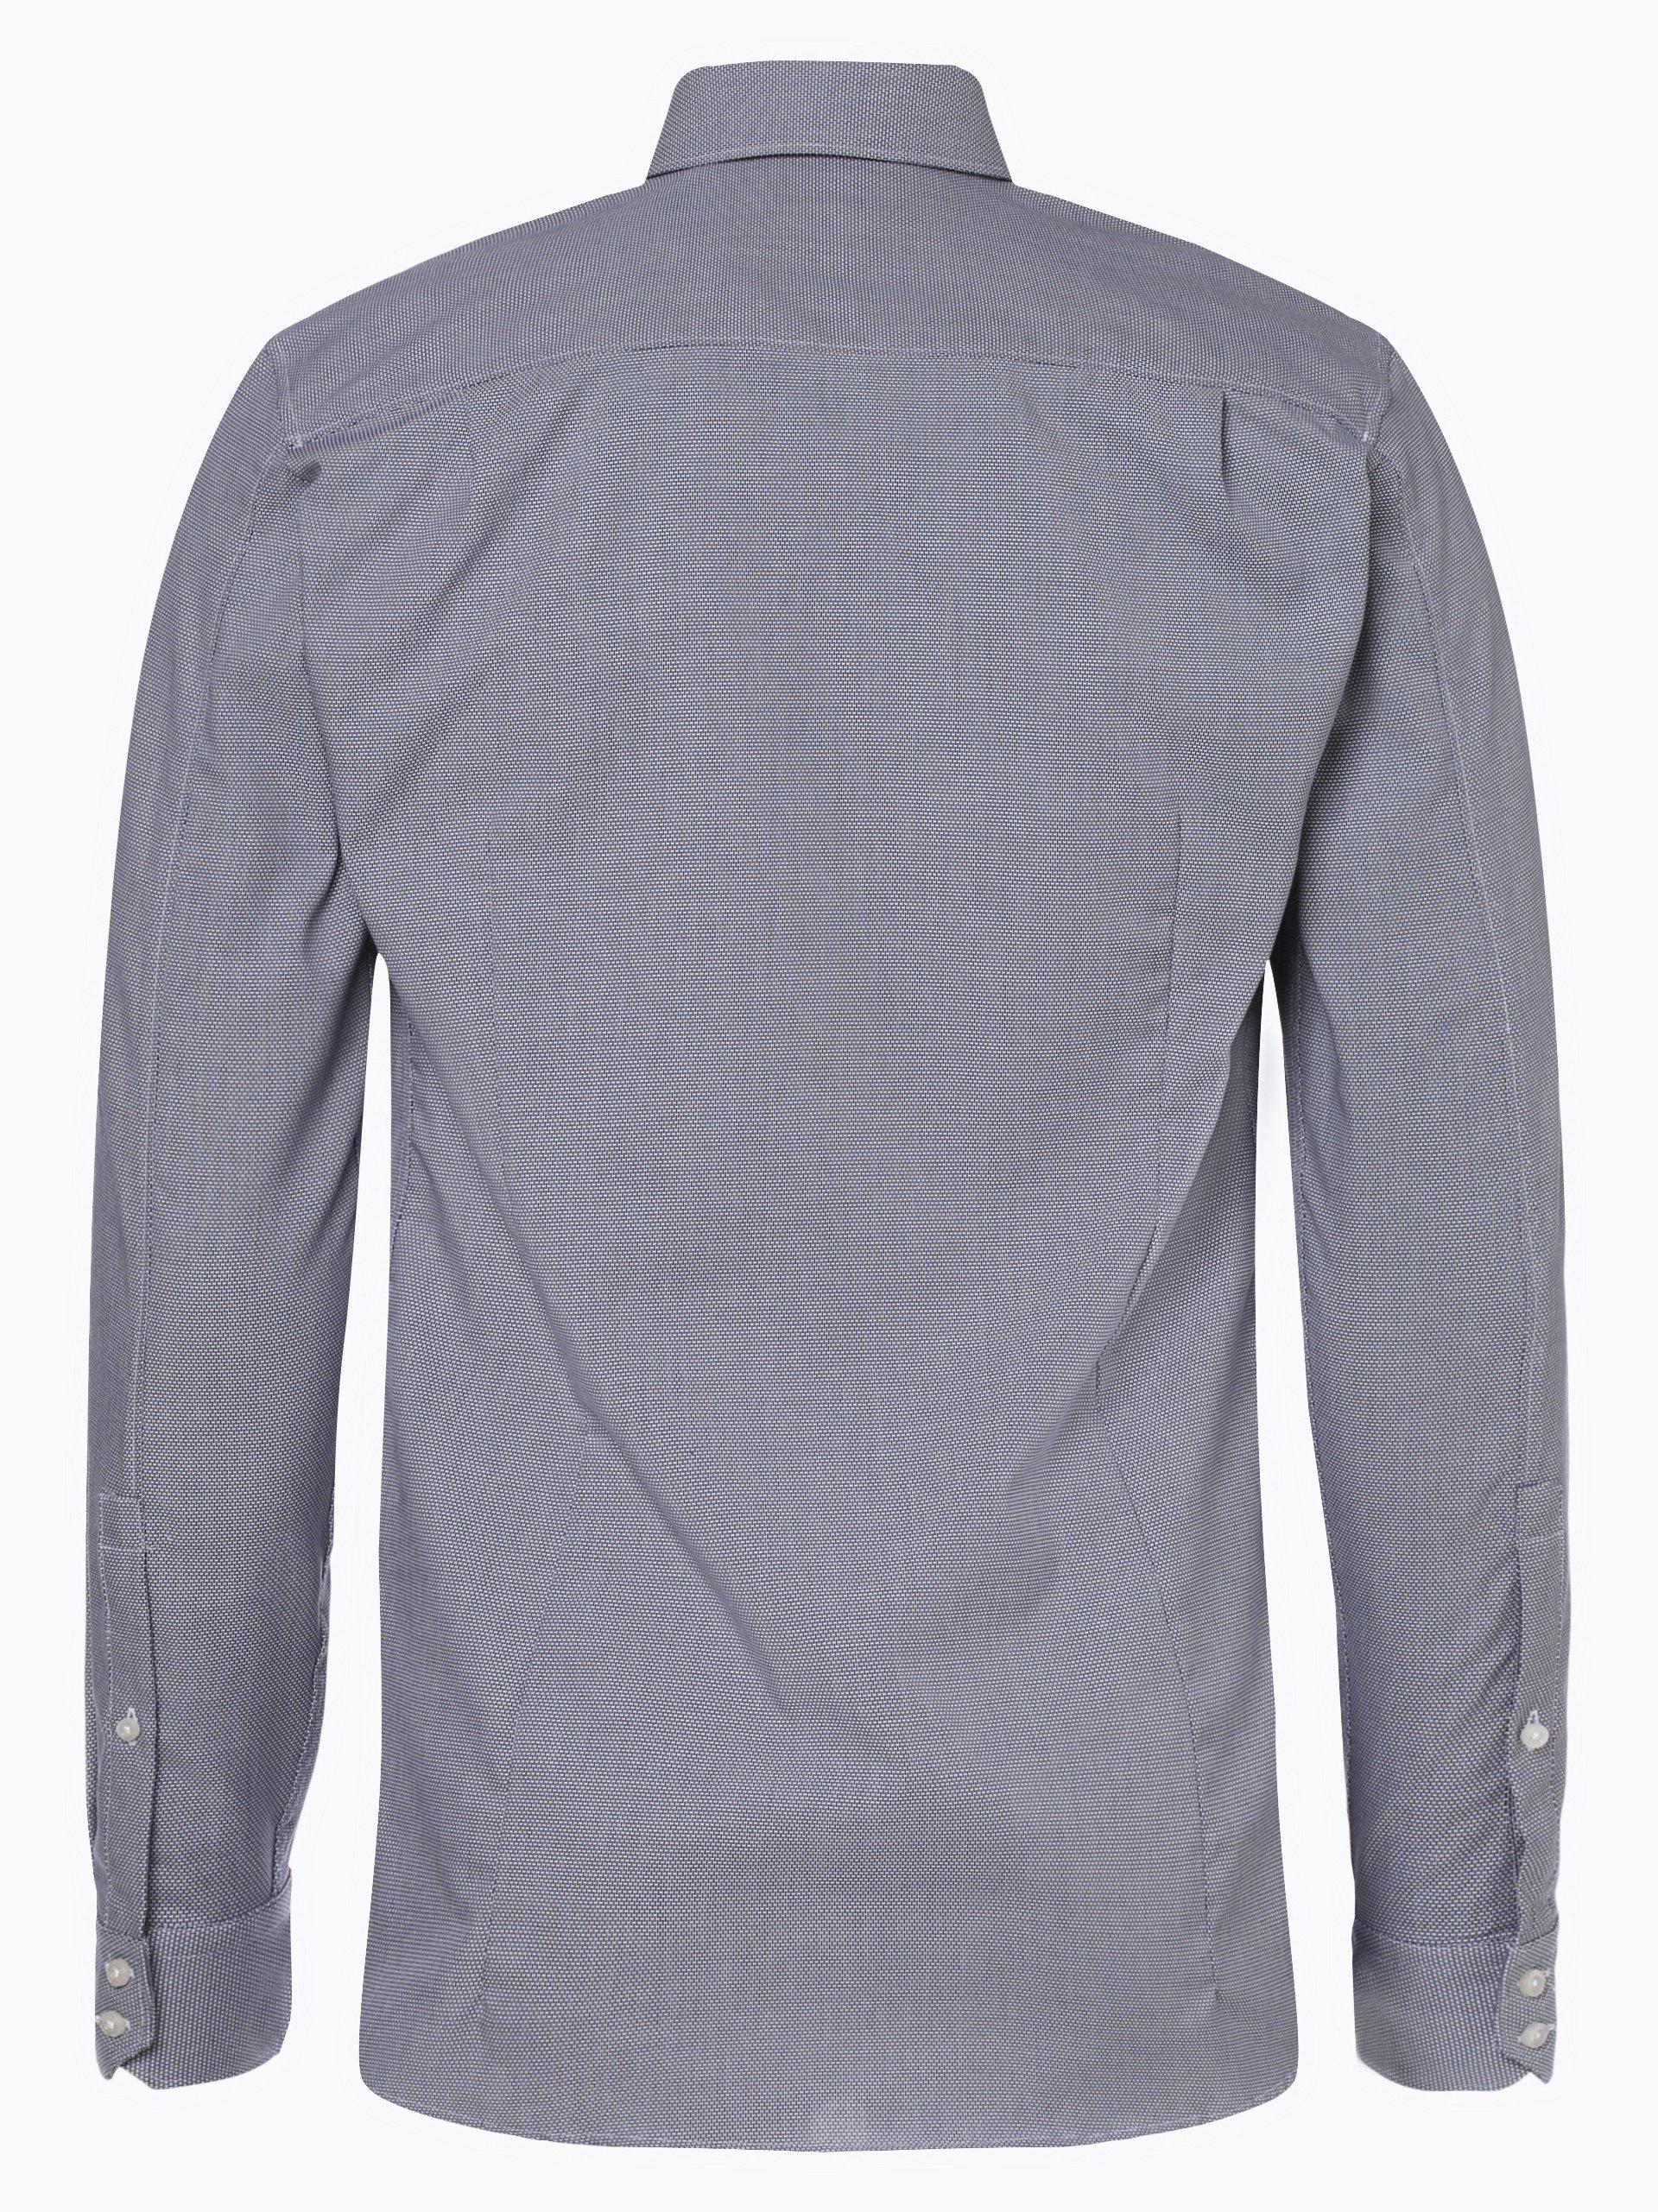 HUGO Herren Hemd - Bügelleicht - Elisha01